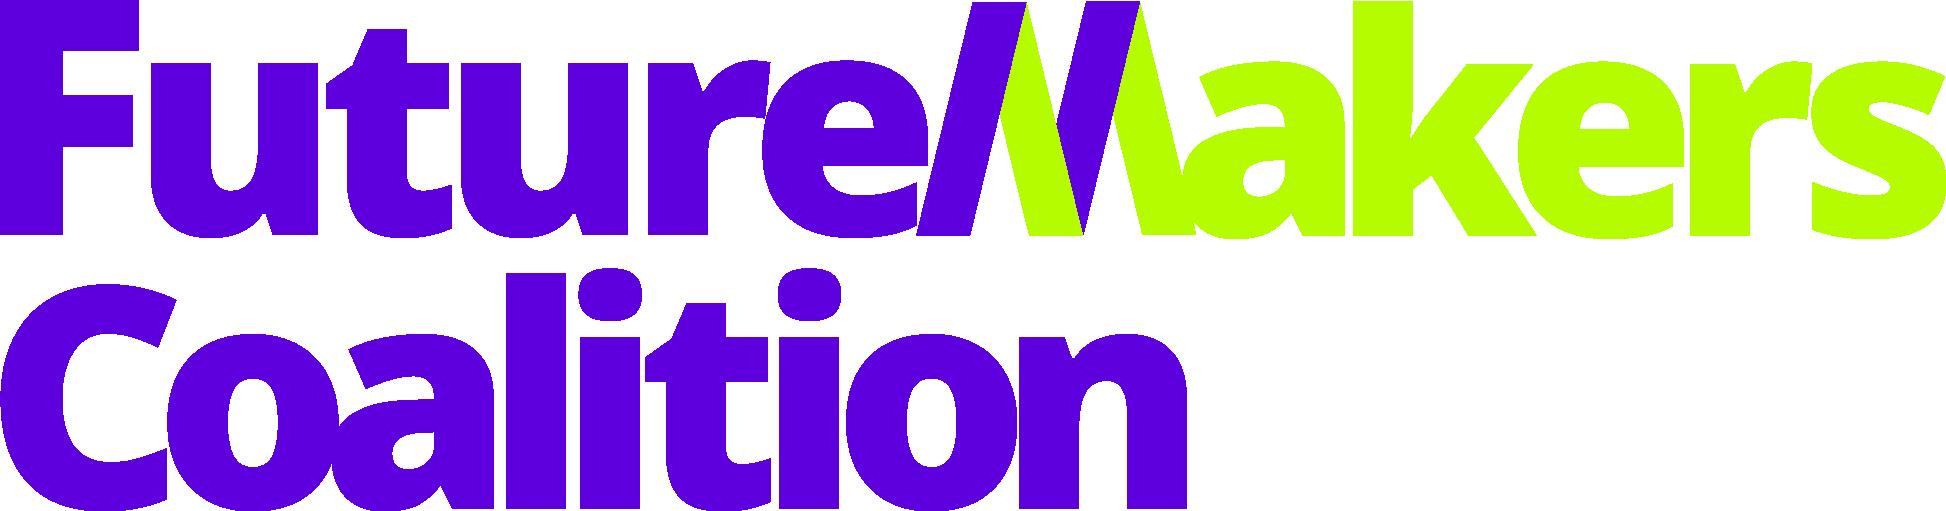 FutureMakers Coalition